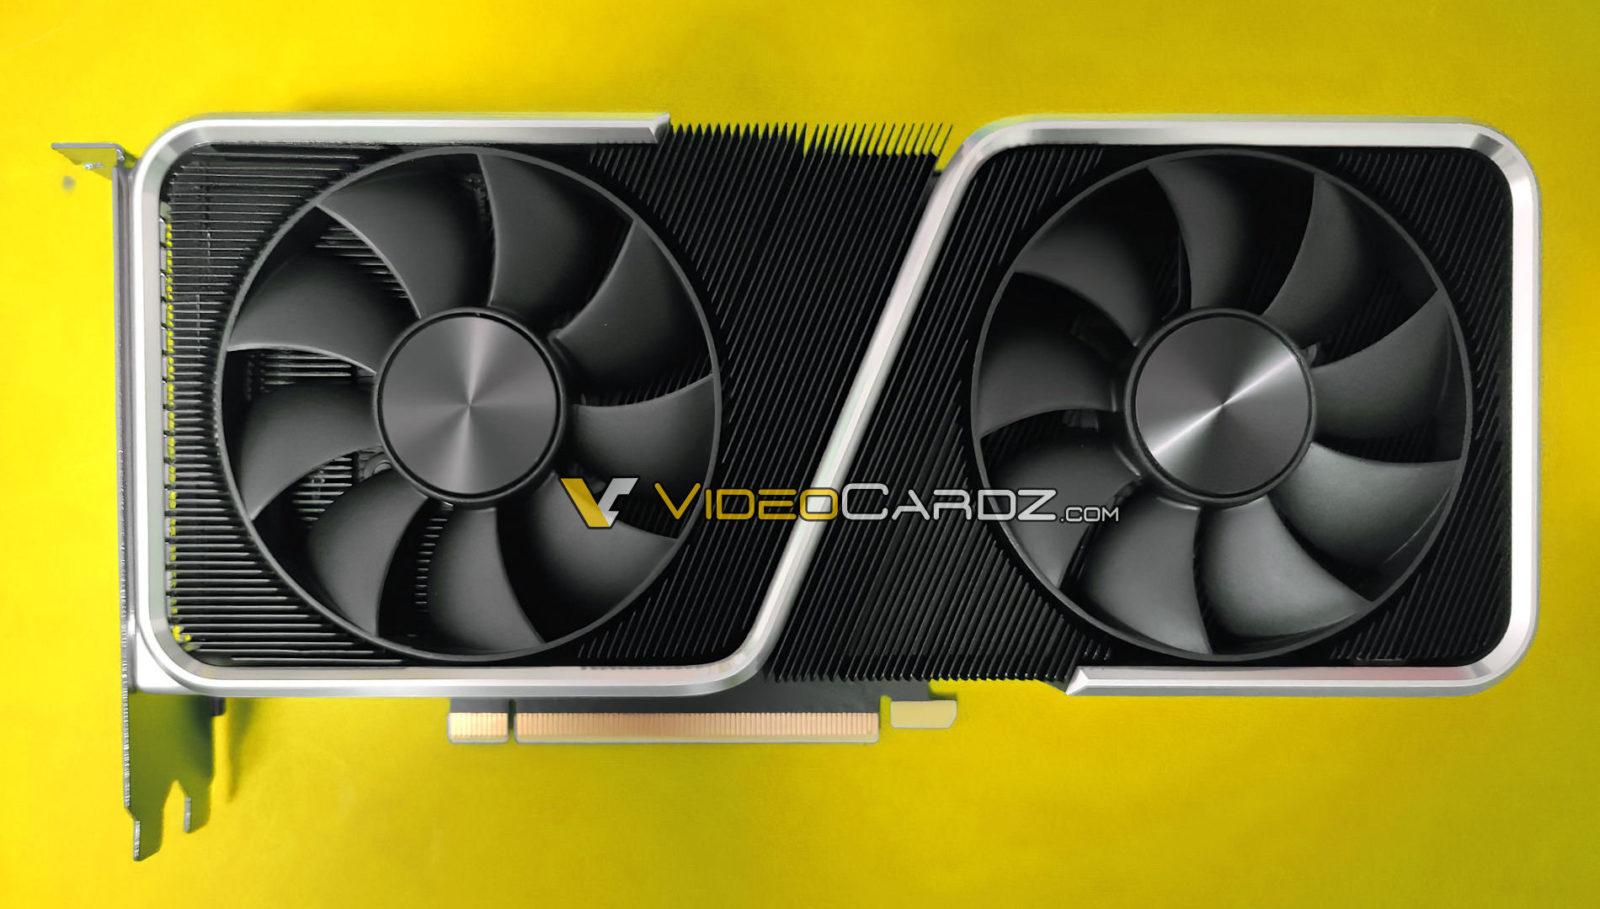 https://www.coolaler.com.tw/image/news/20/11/NVIDIA-GeForce-RTX-3060-ti-fe_1.jpg